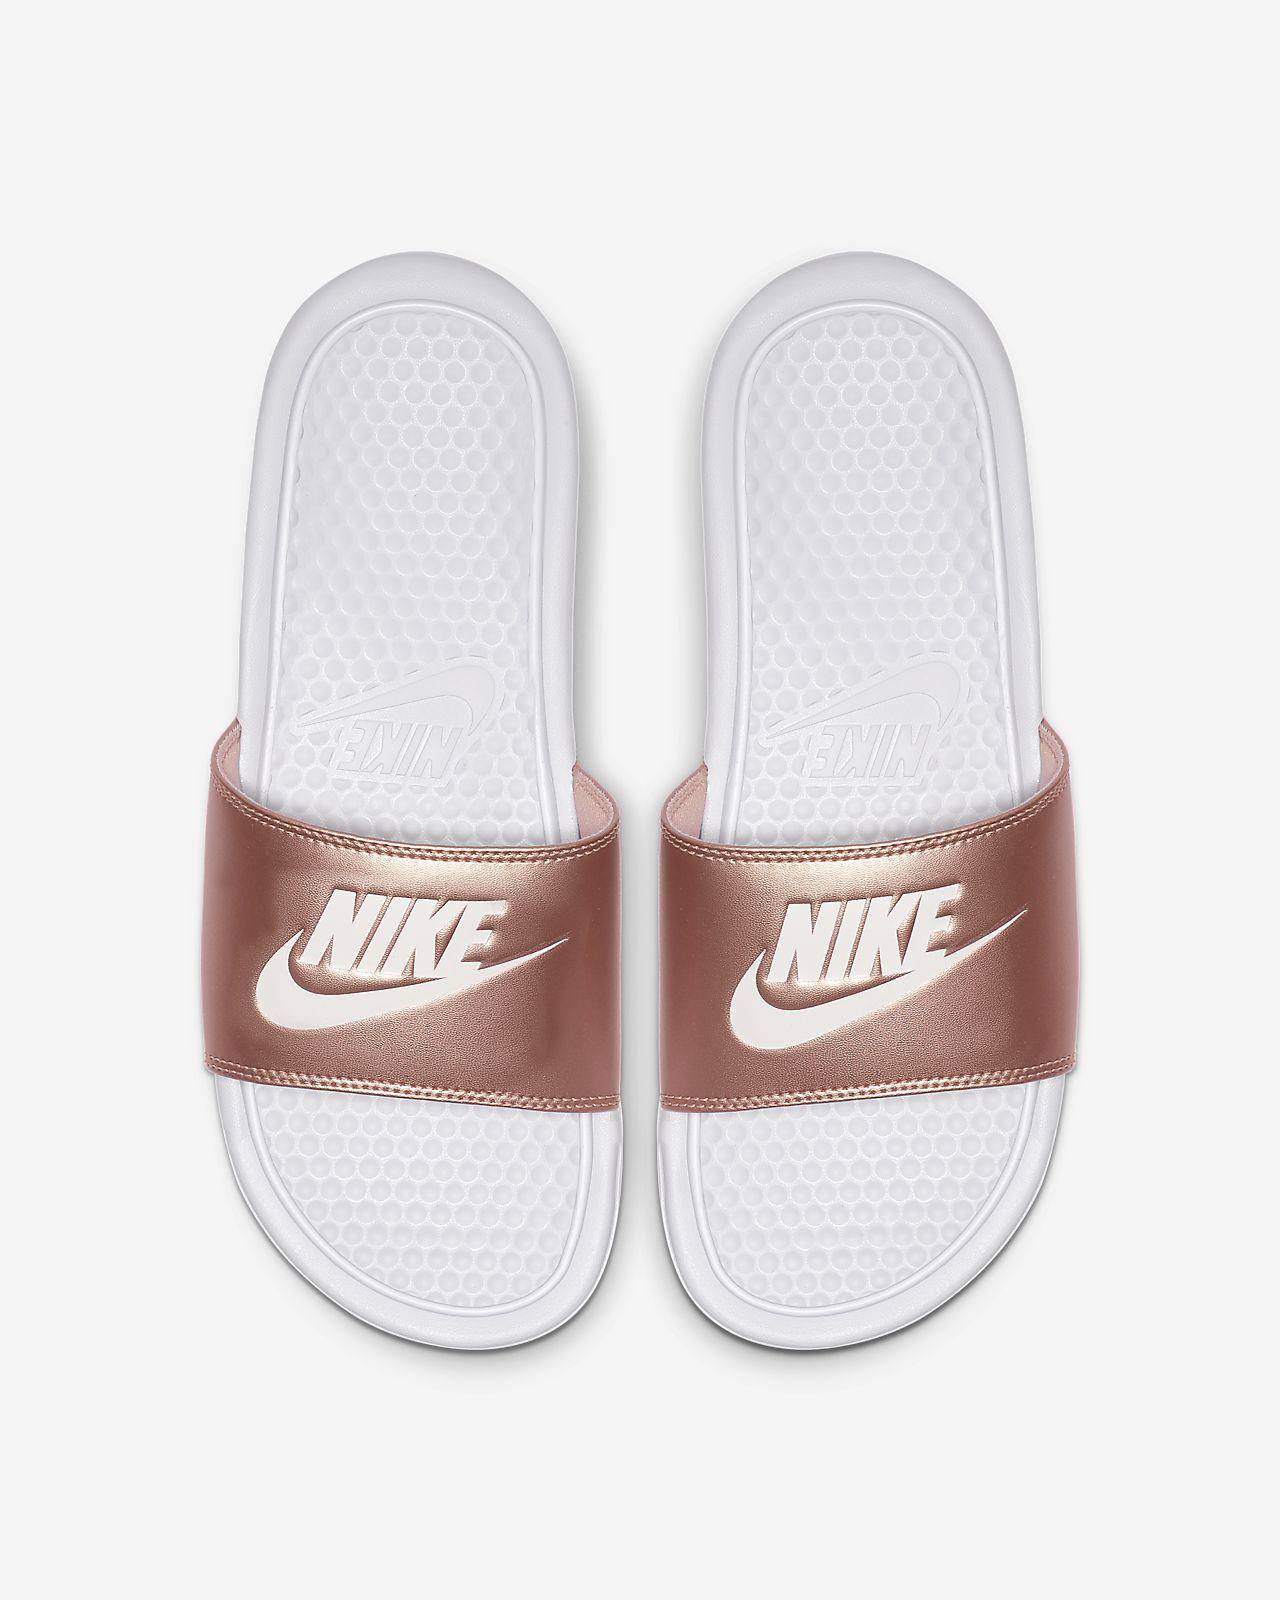 Nike Benassi JDI Women's Slide